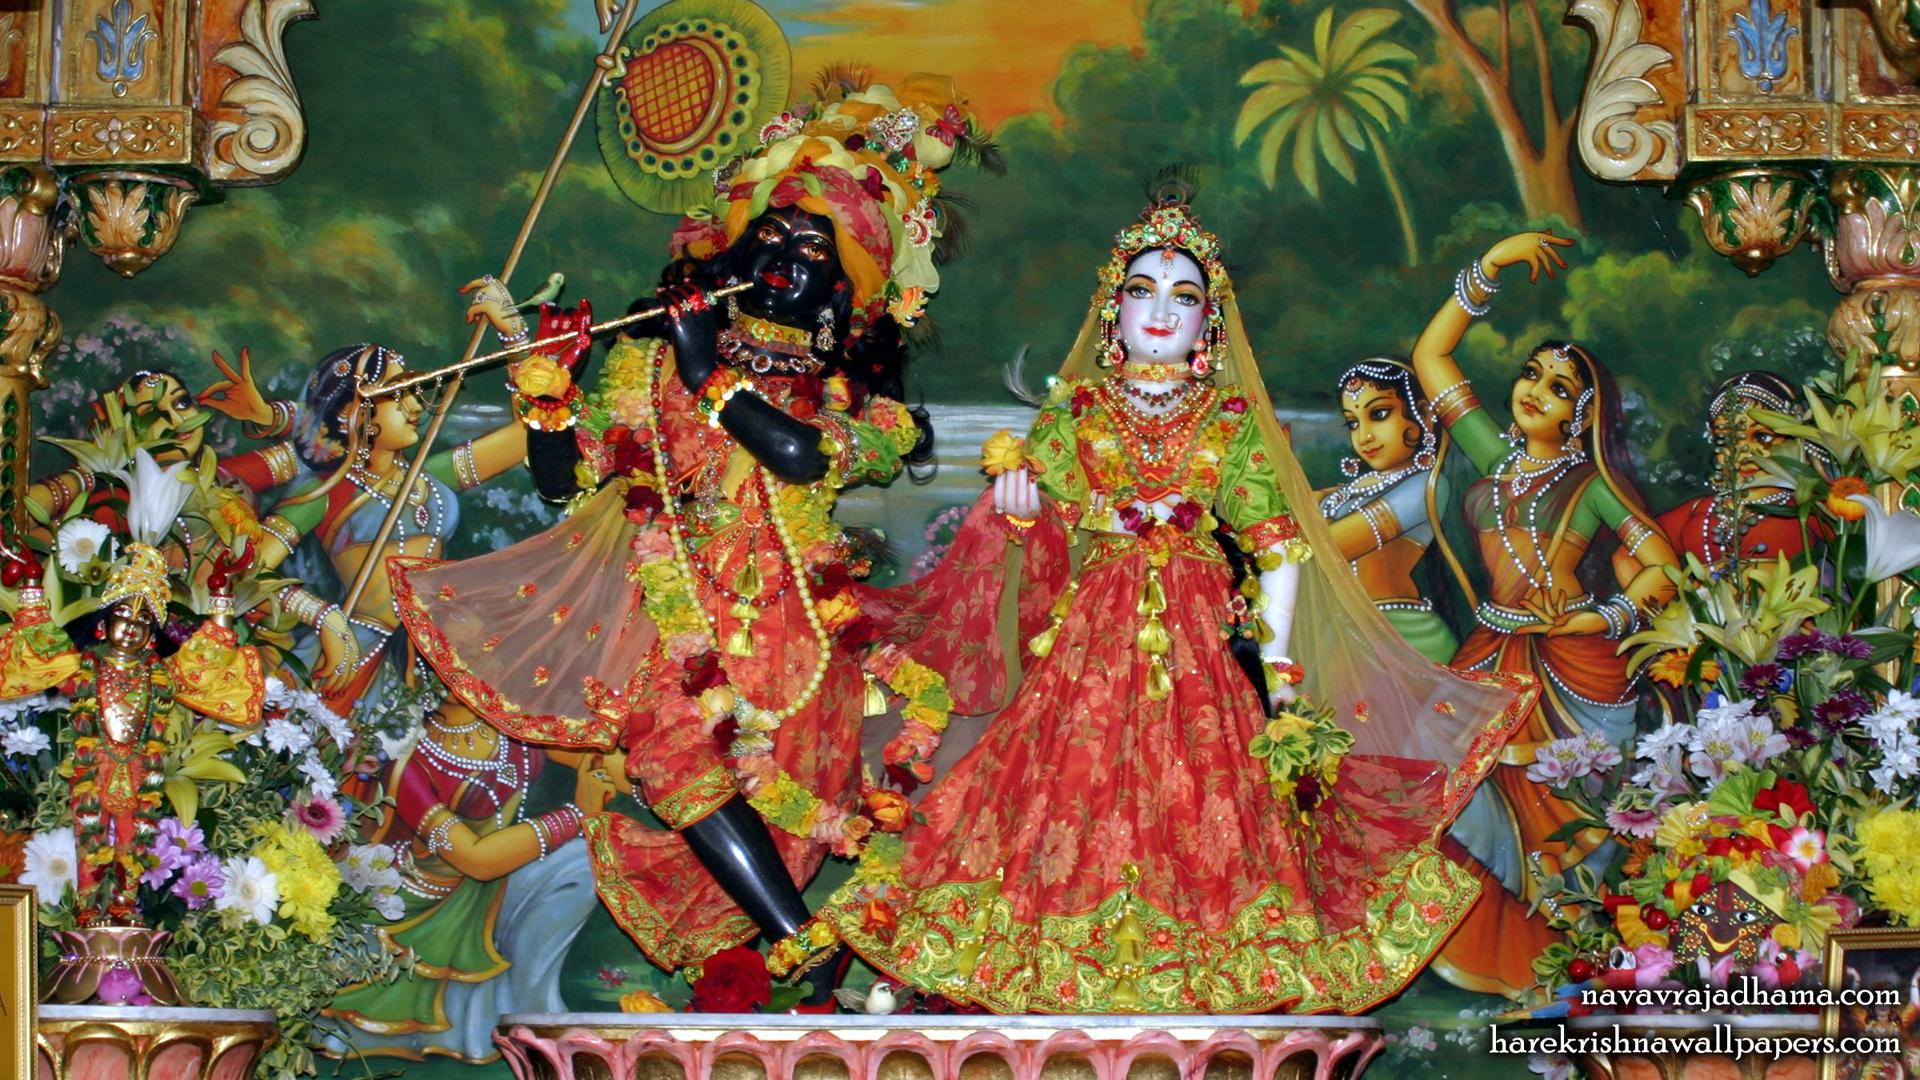 Sri Sri Radha Shyamsundar Wallpaper (003) Size 1920x1080 Download